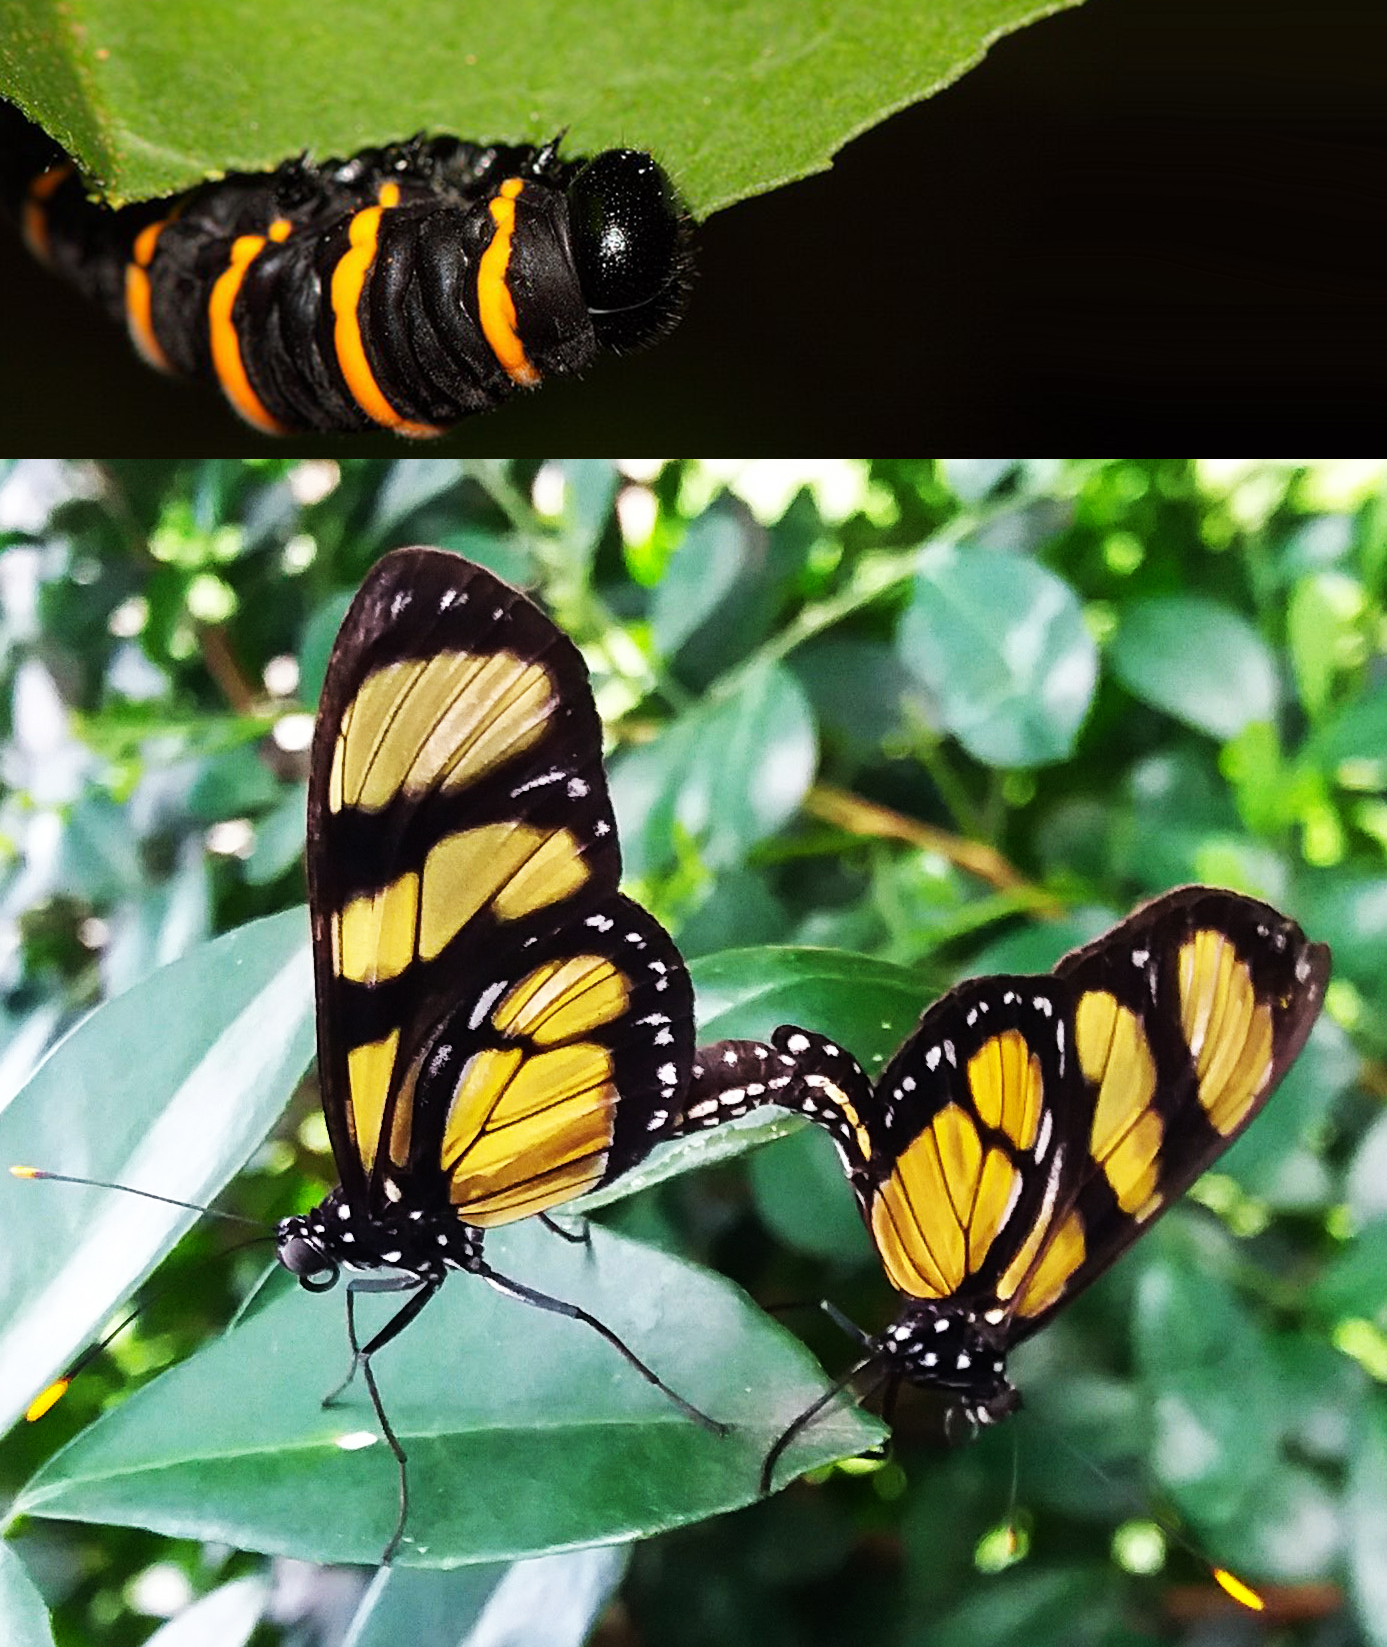 Imagem de lagarta de borboleta-do-manacá acima e imagem Borboleta-do-manacá pousada em uma folhas de manacá abaixo